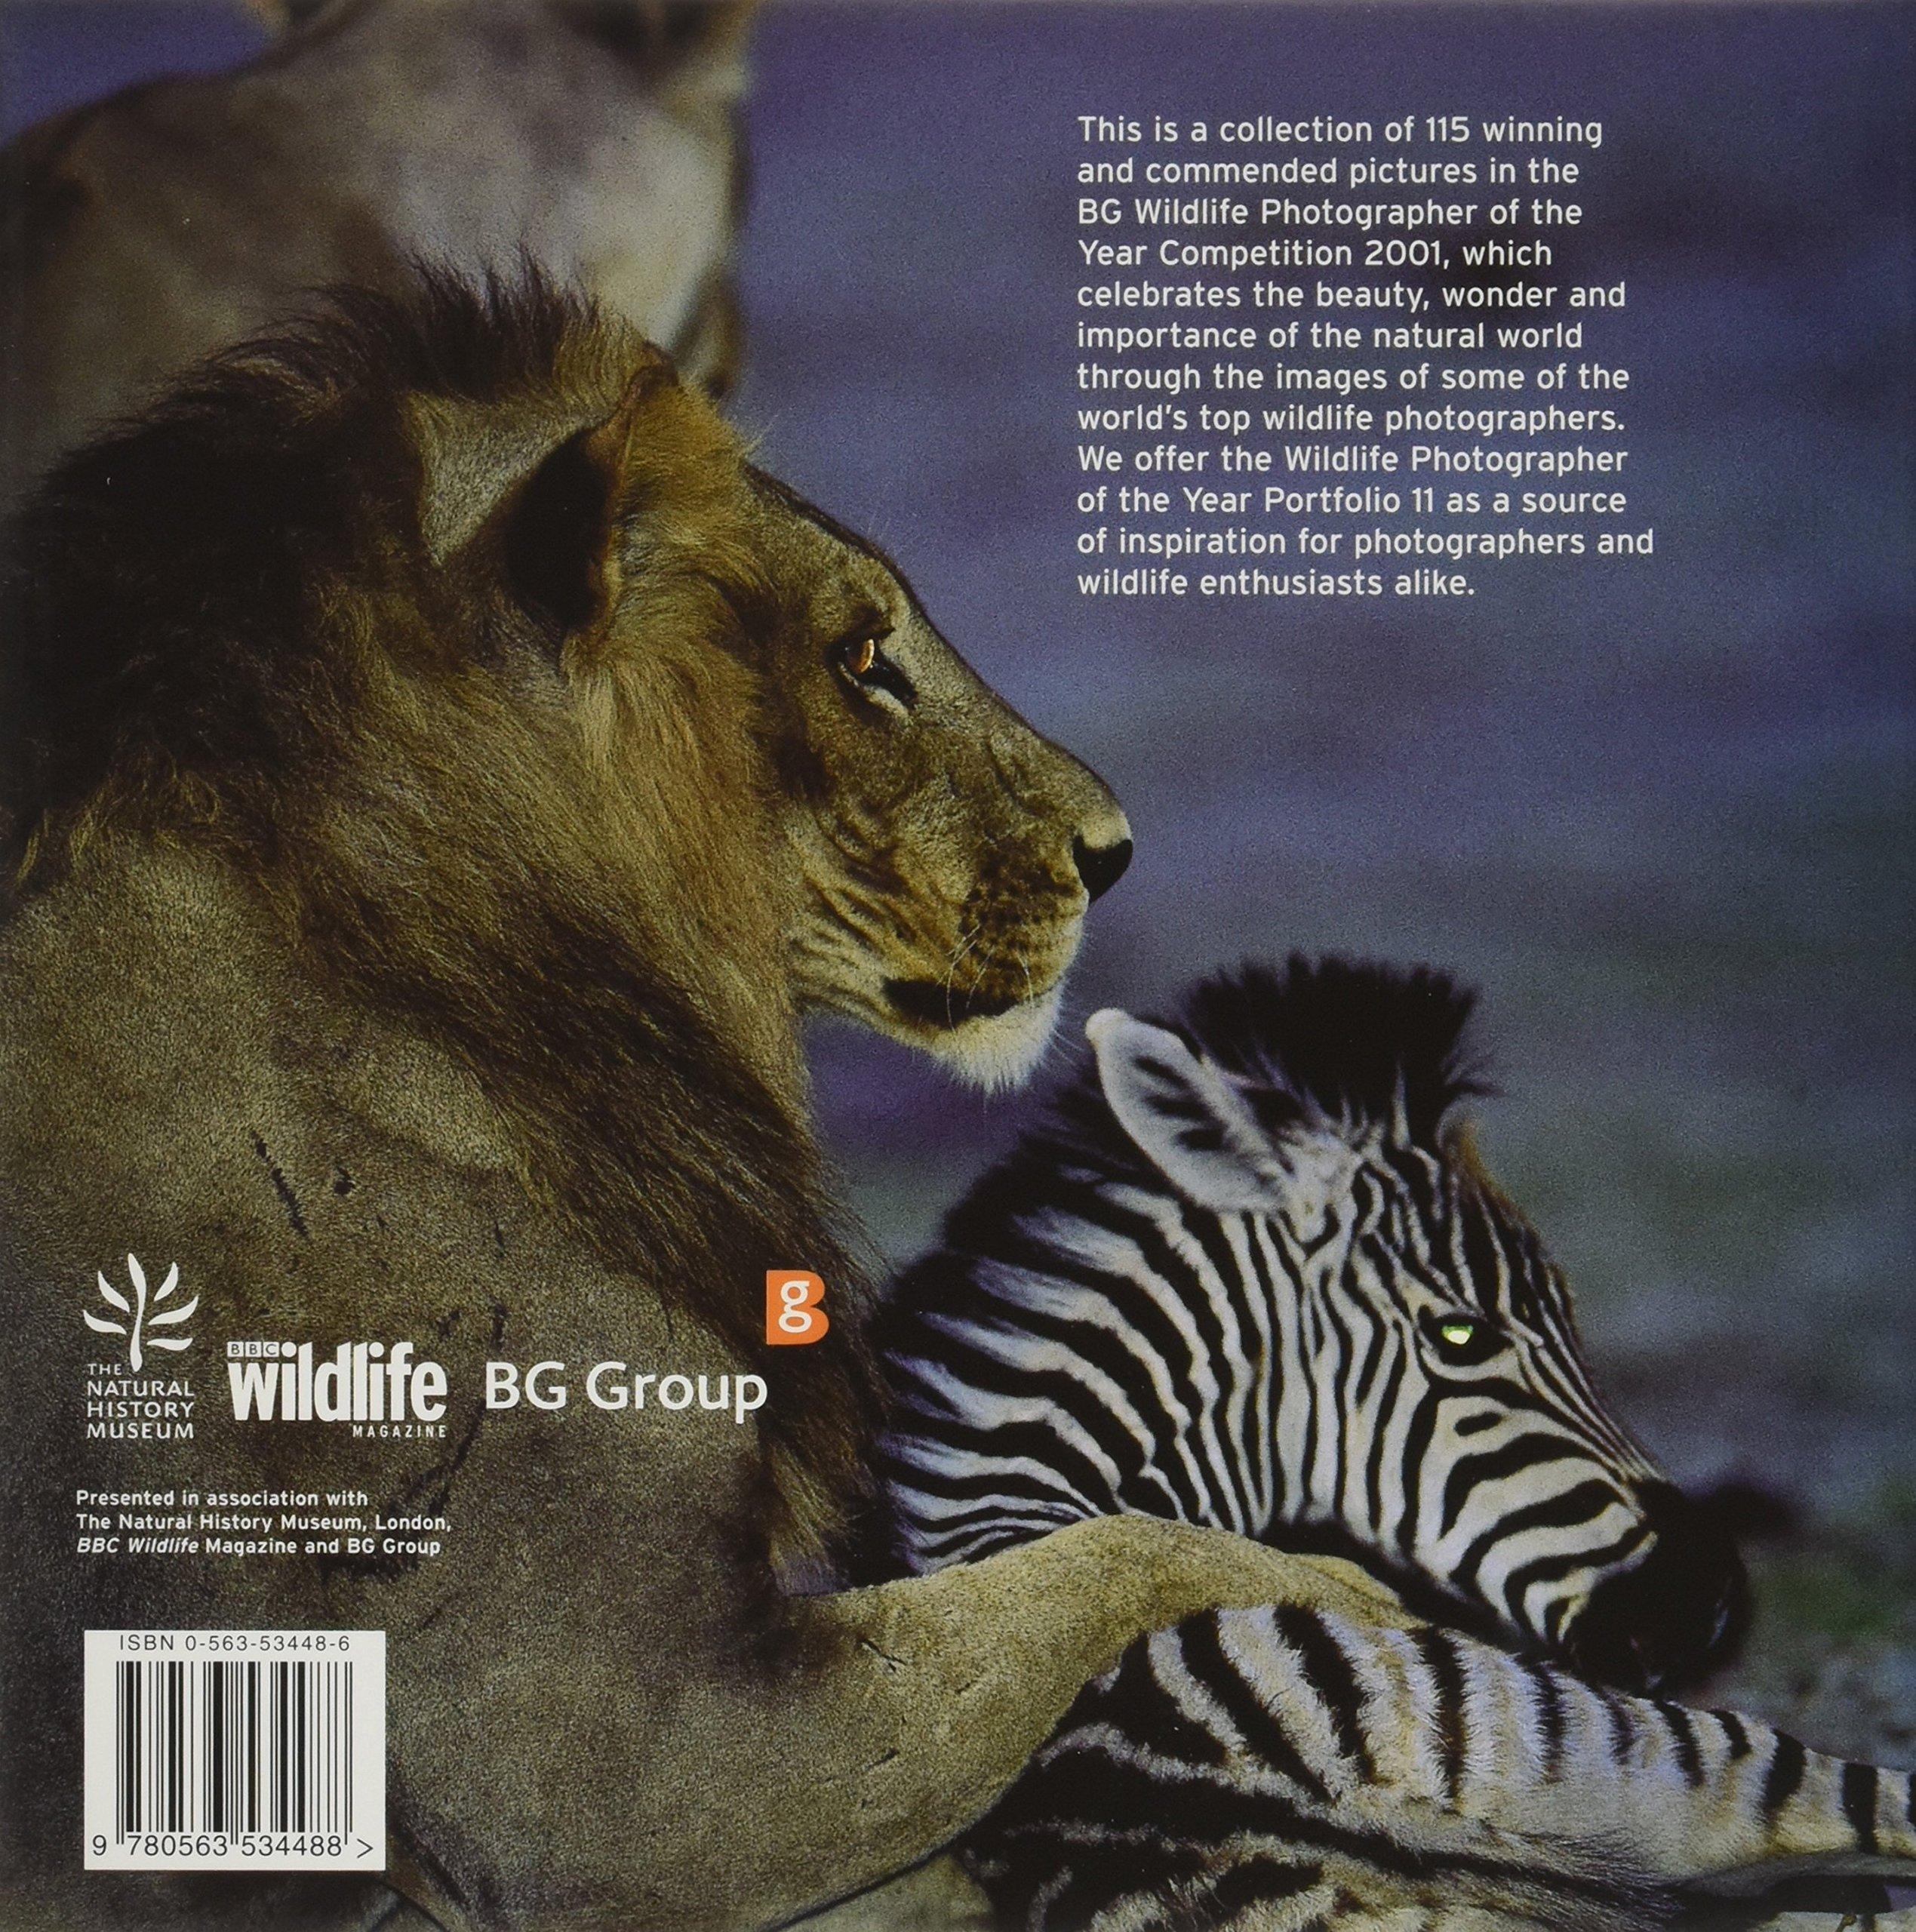 Amazon.com: Wildlife Photographer of the Year: Portfolio 11 (9780563534488): BBC Books: Books